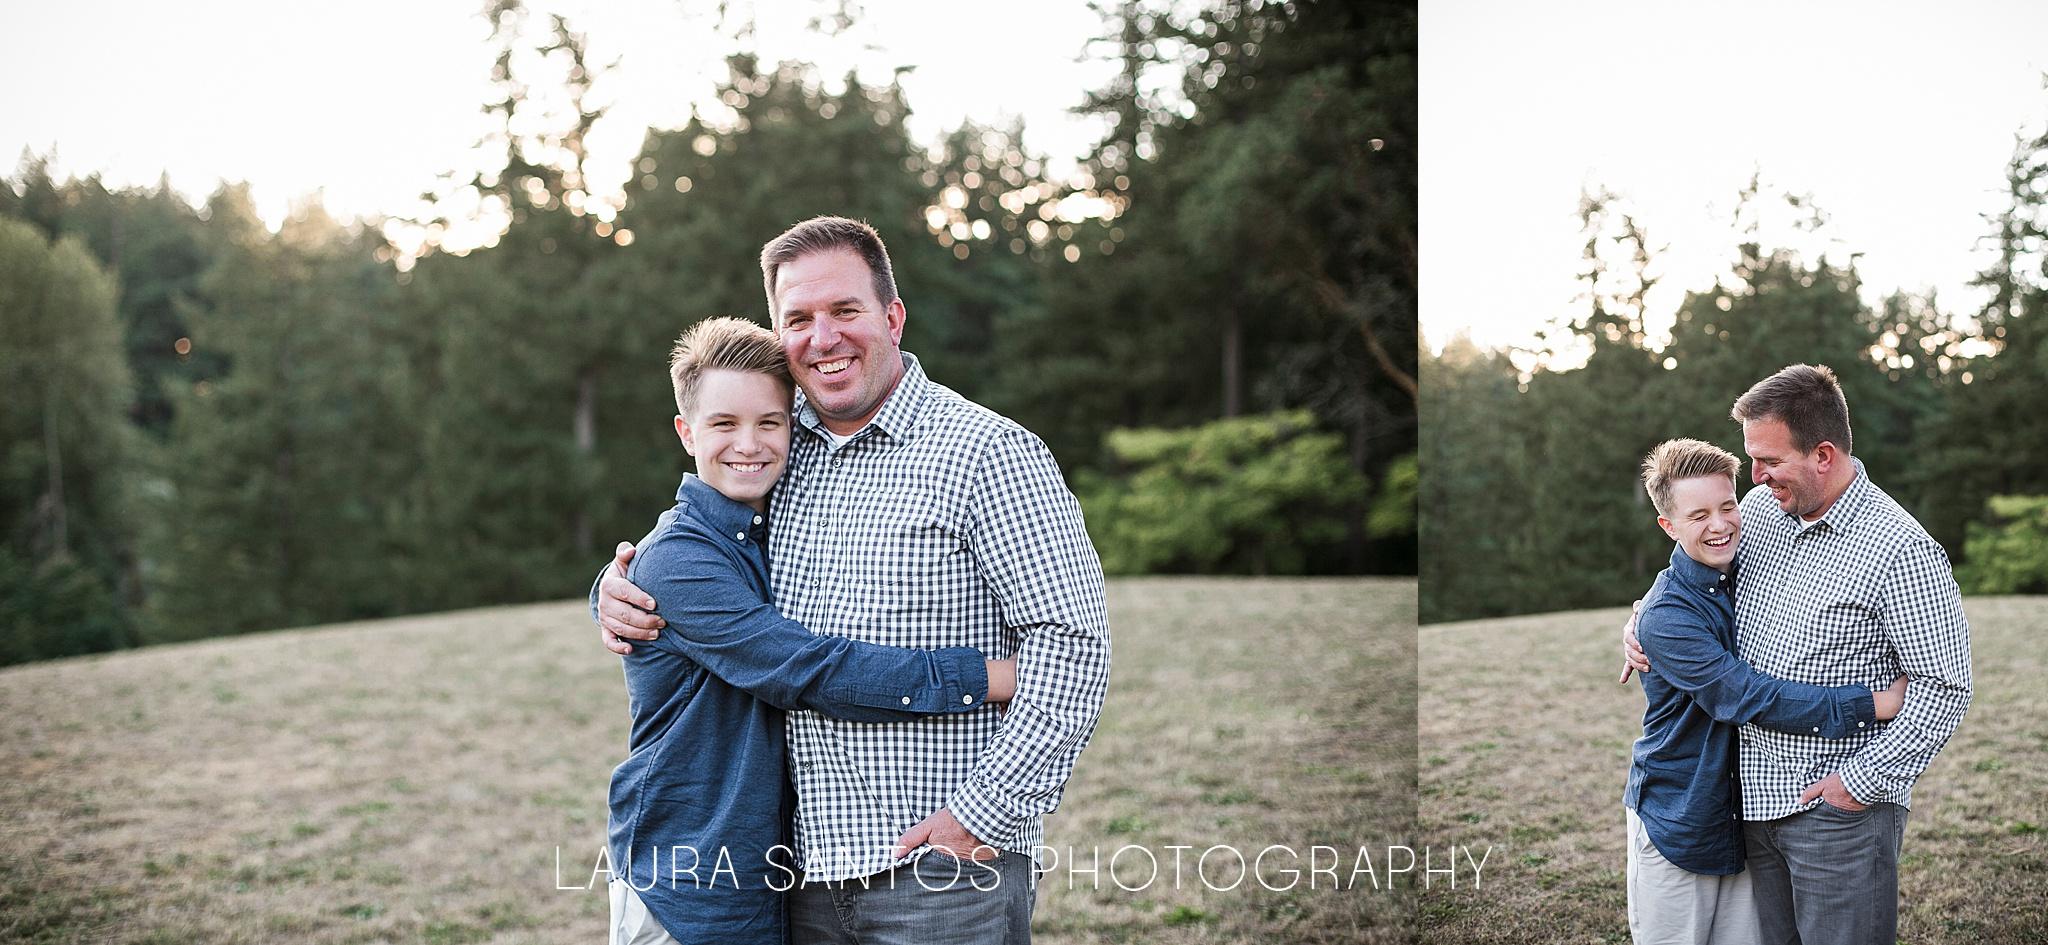 Laura Santos Photography Portland Oregon Family Photographer_0791.jpg